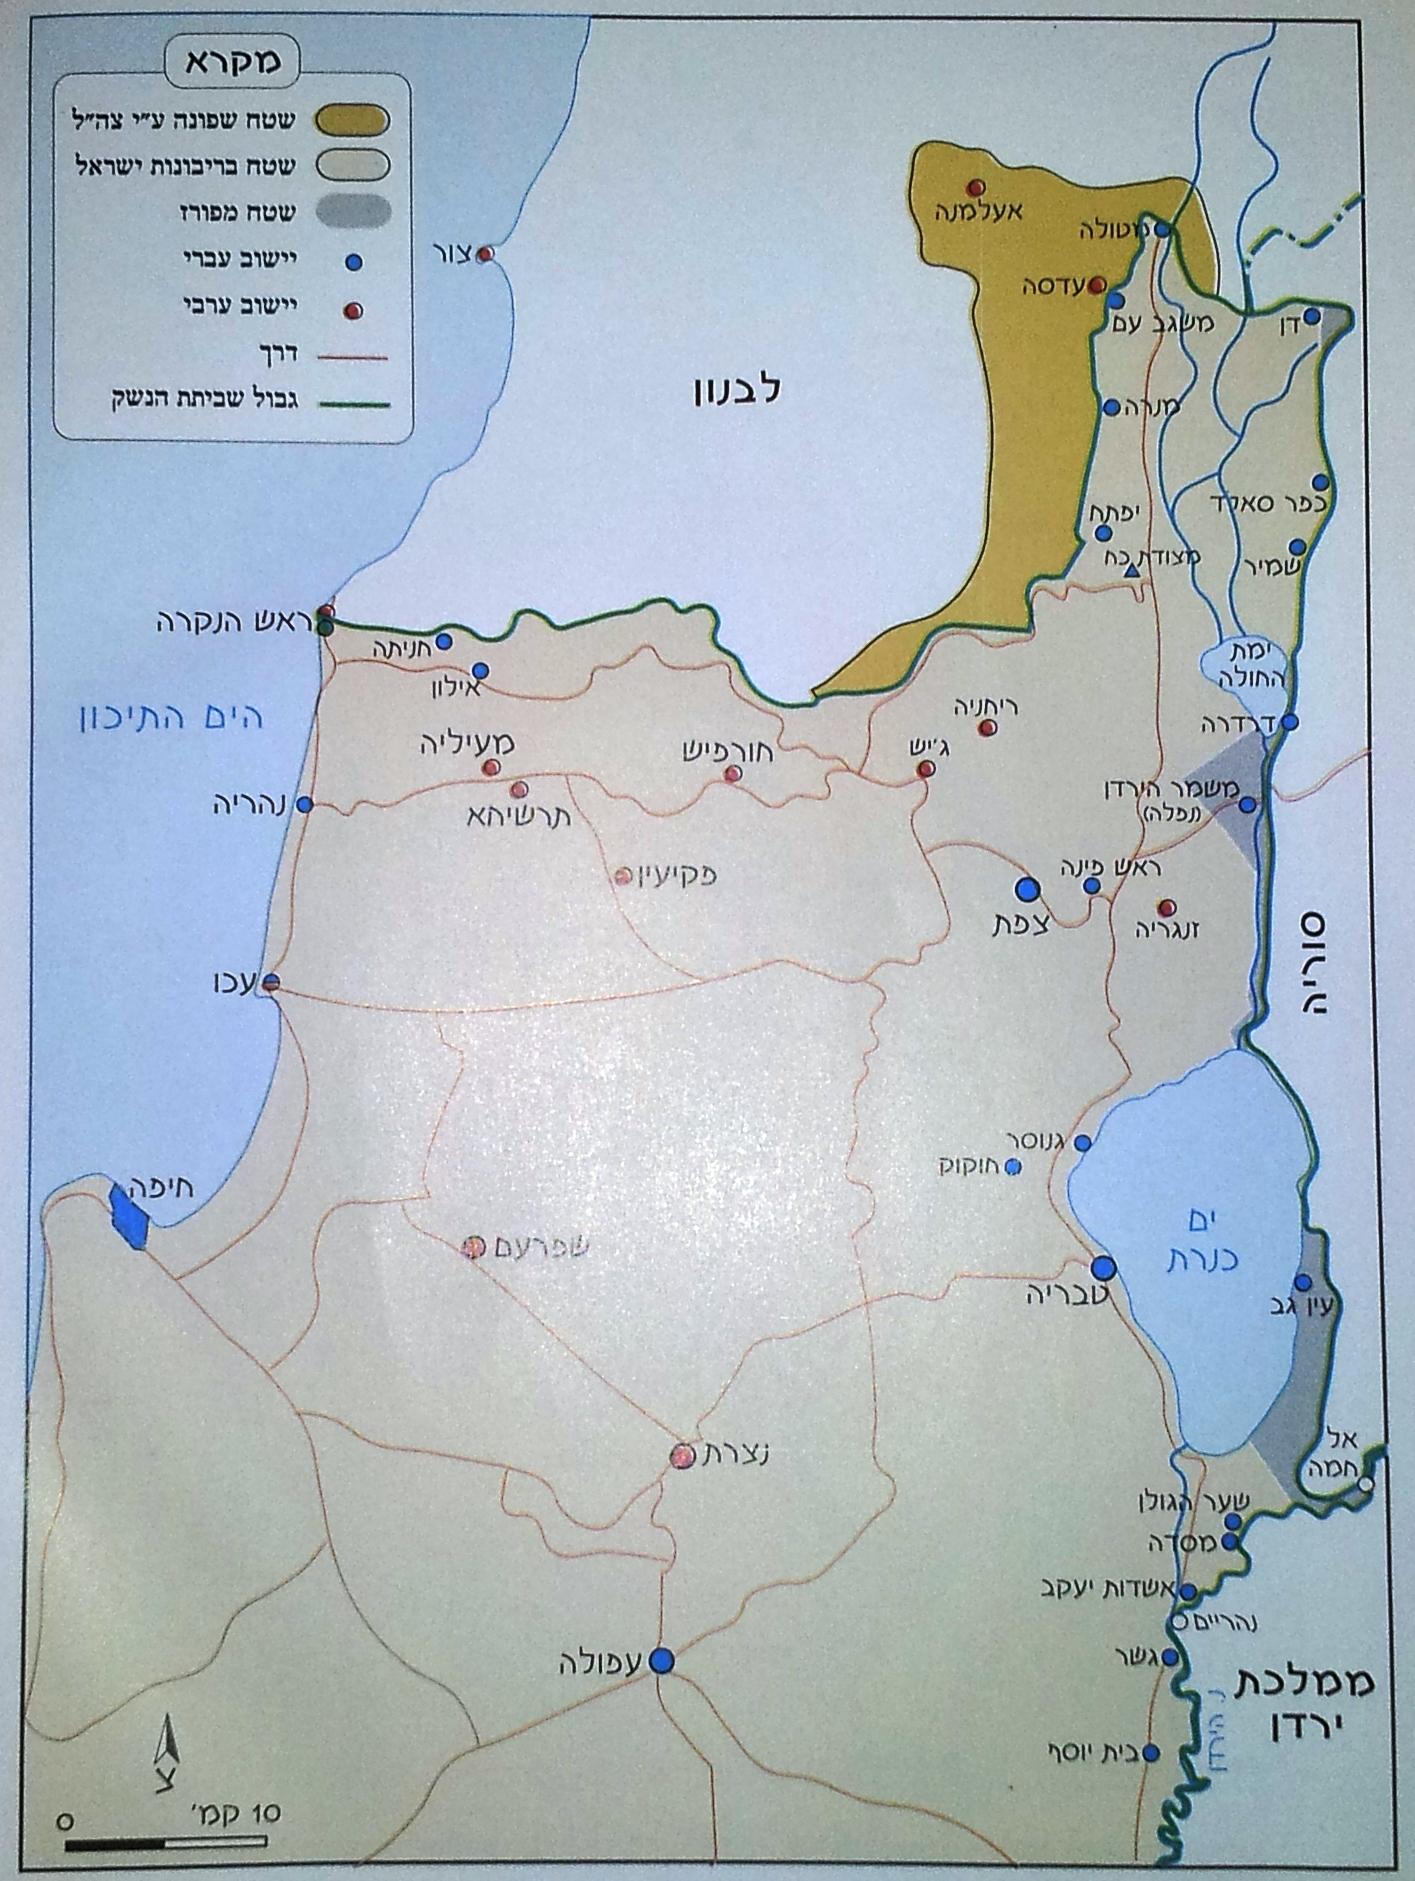 Israel syria and israel lebanon armistice agreements map citation sciox Gallery